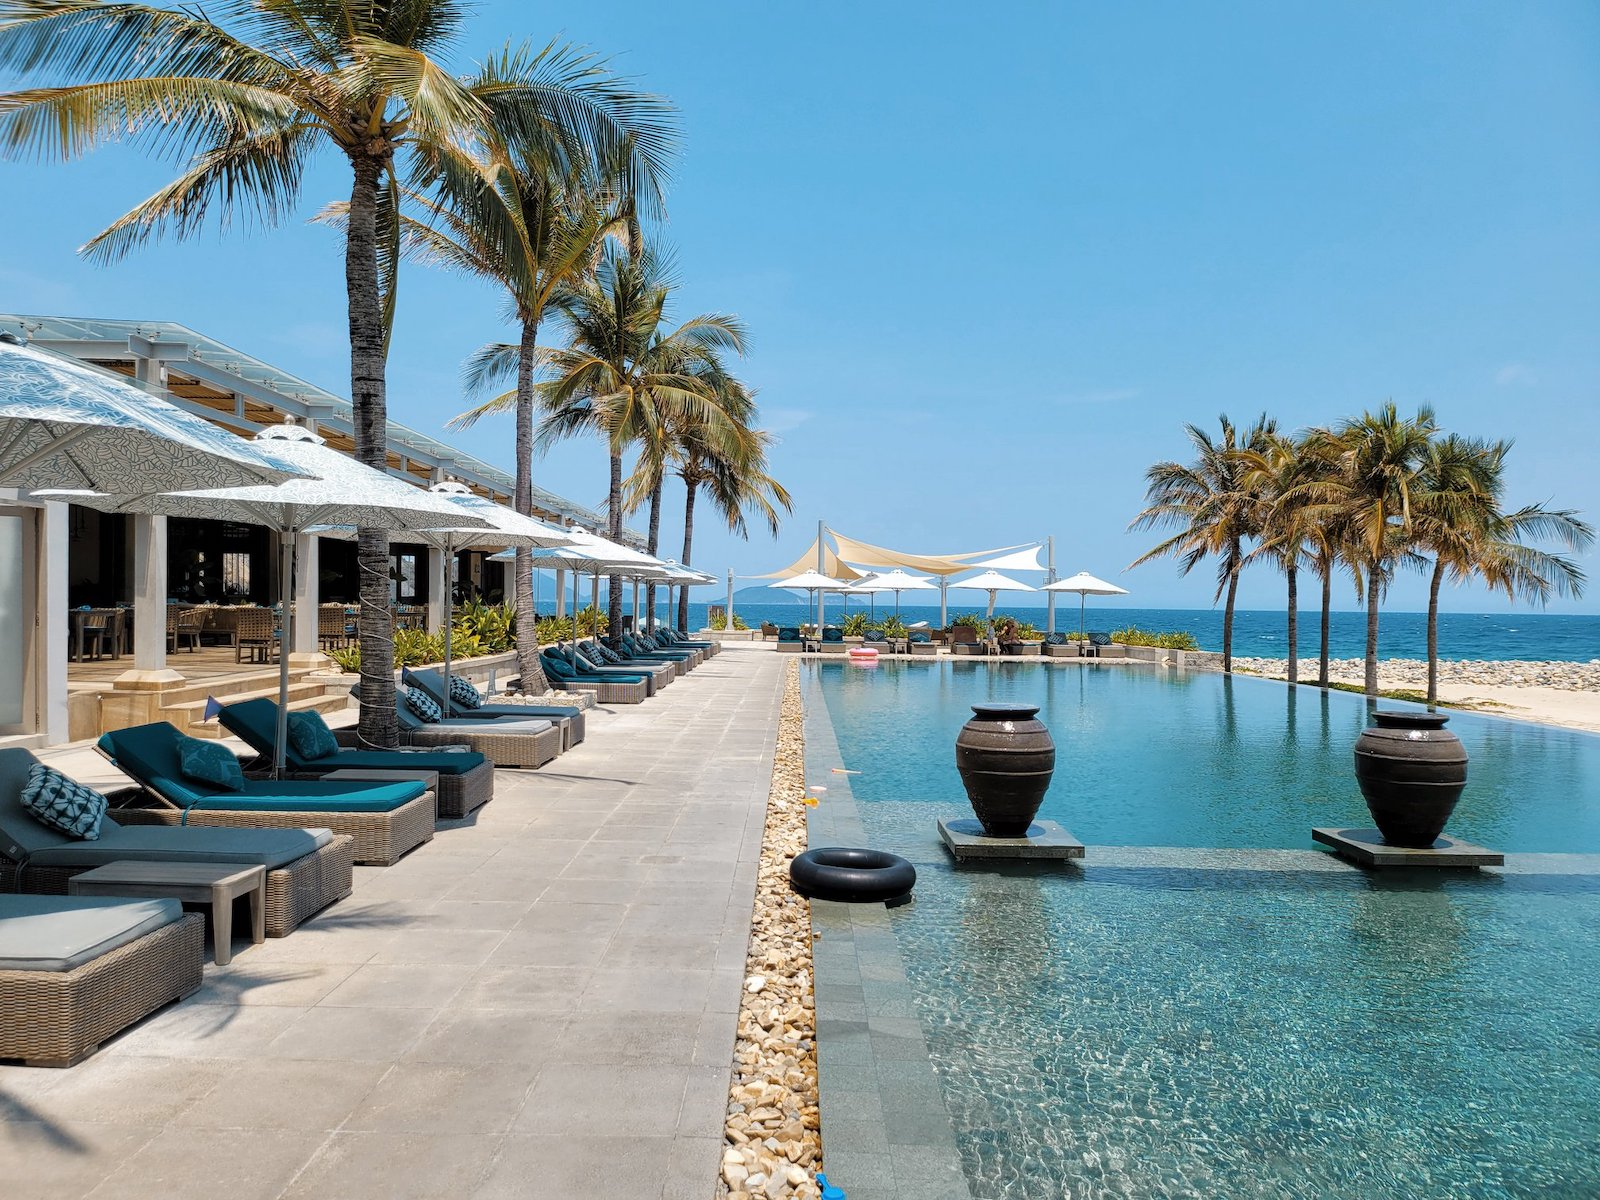 Image of the pool at the Mia Resort Nha Trang in Vietnam